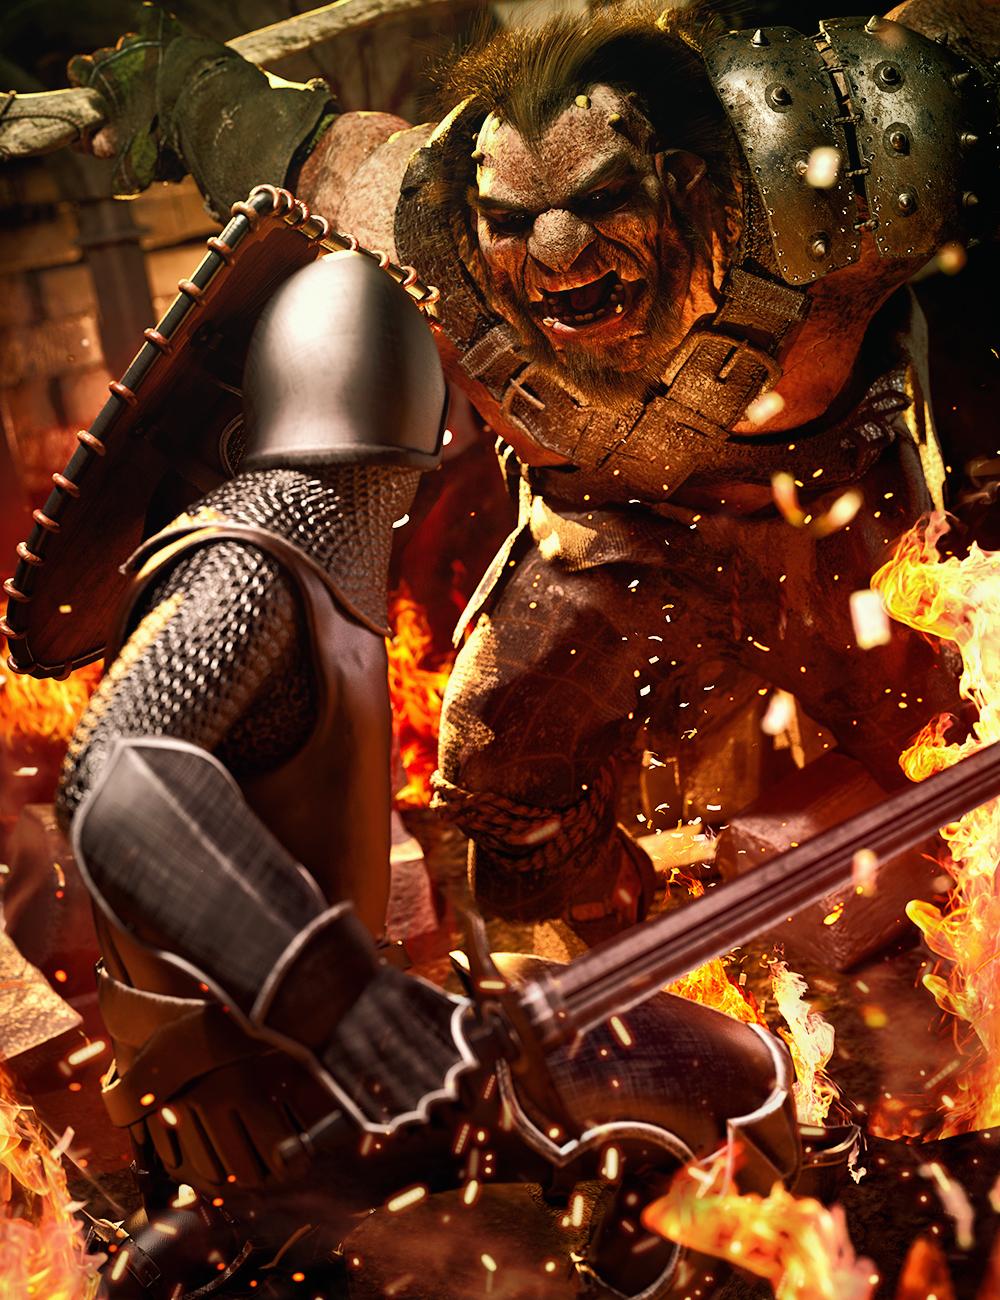 Jazz 8.1 Knight vs. the Giant Bundle by: , 3D Models by Daz 3D